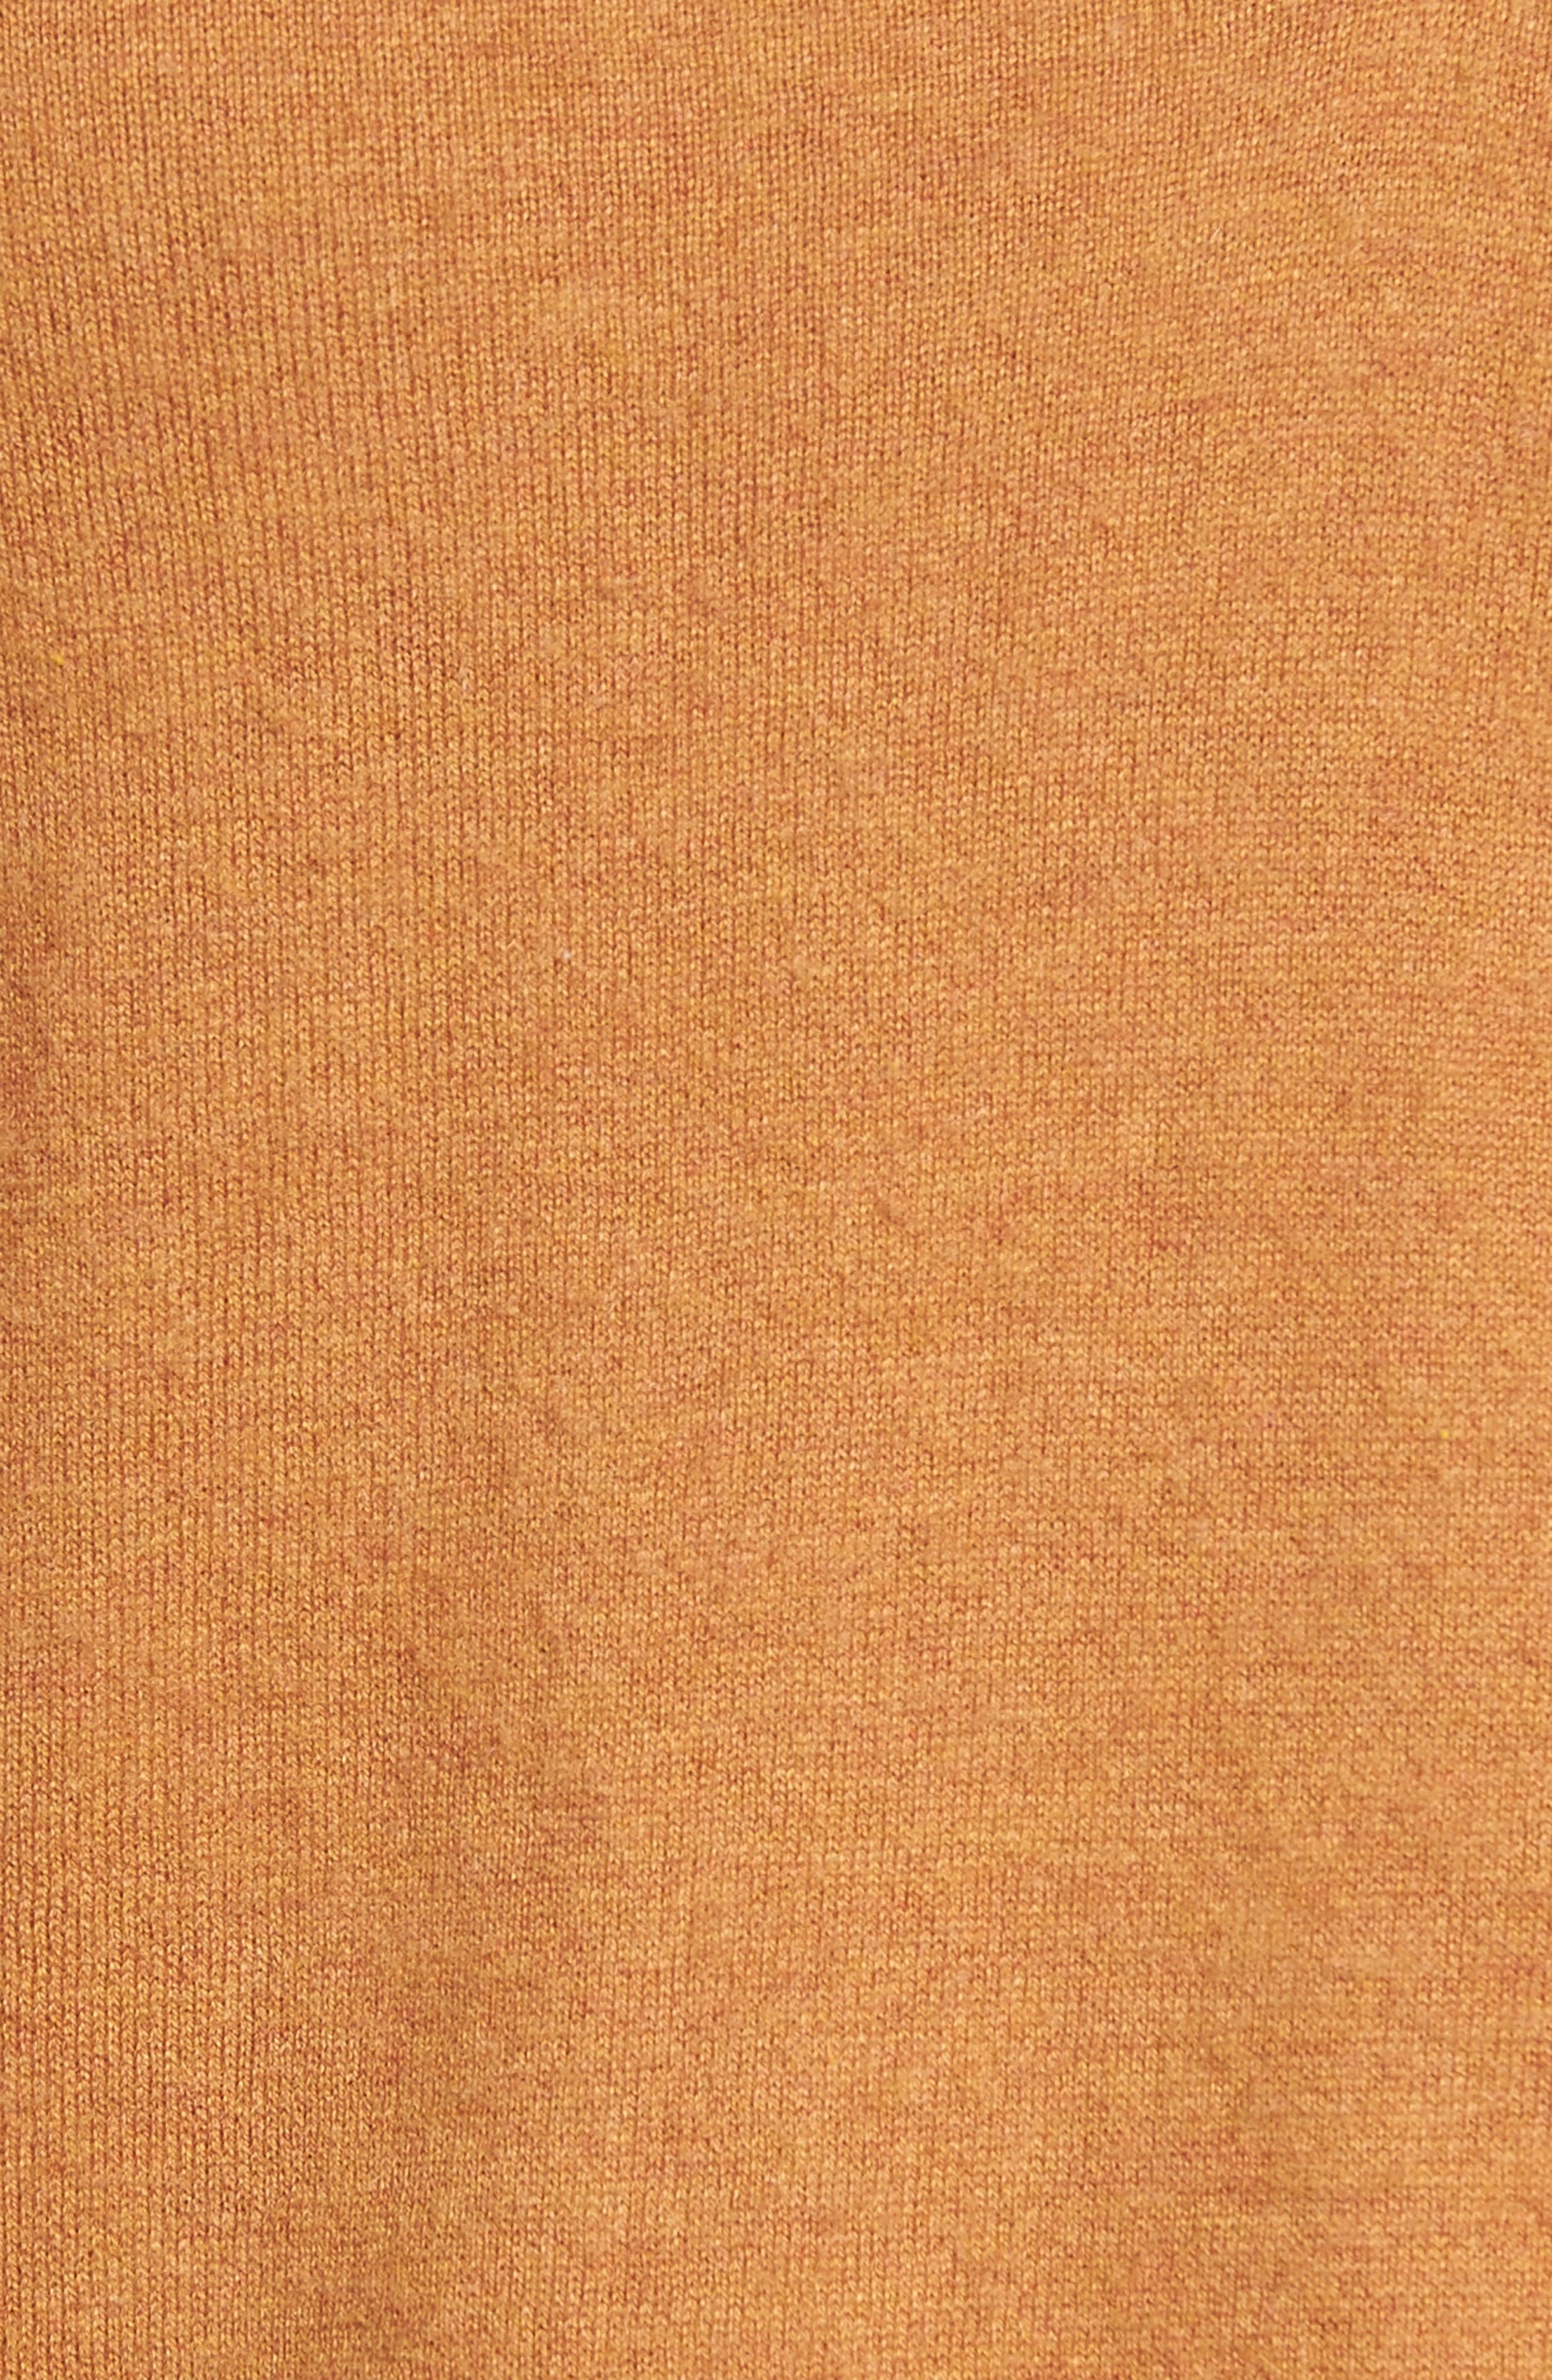 V-Neck Sweater,                             Alternate thumbnail 5, color,                             Tan Sugar Heather